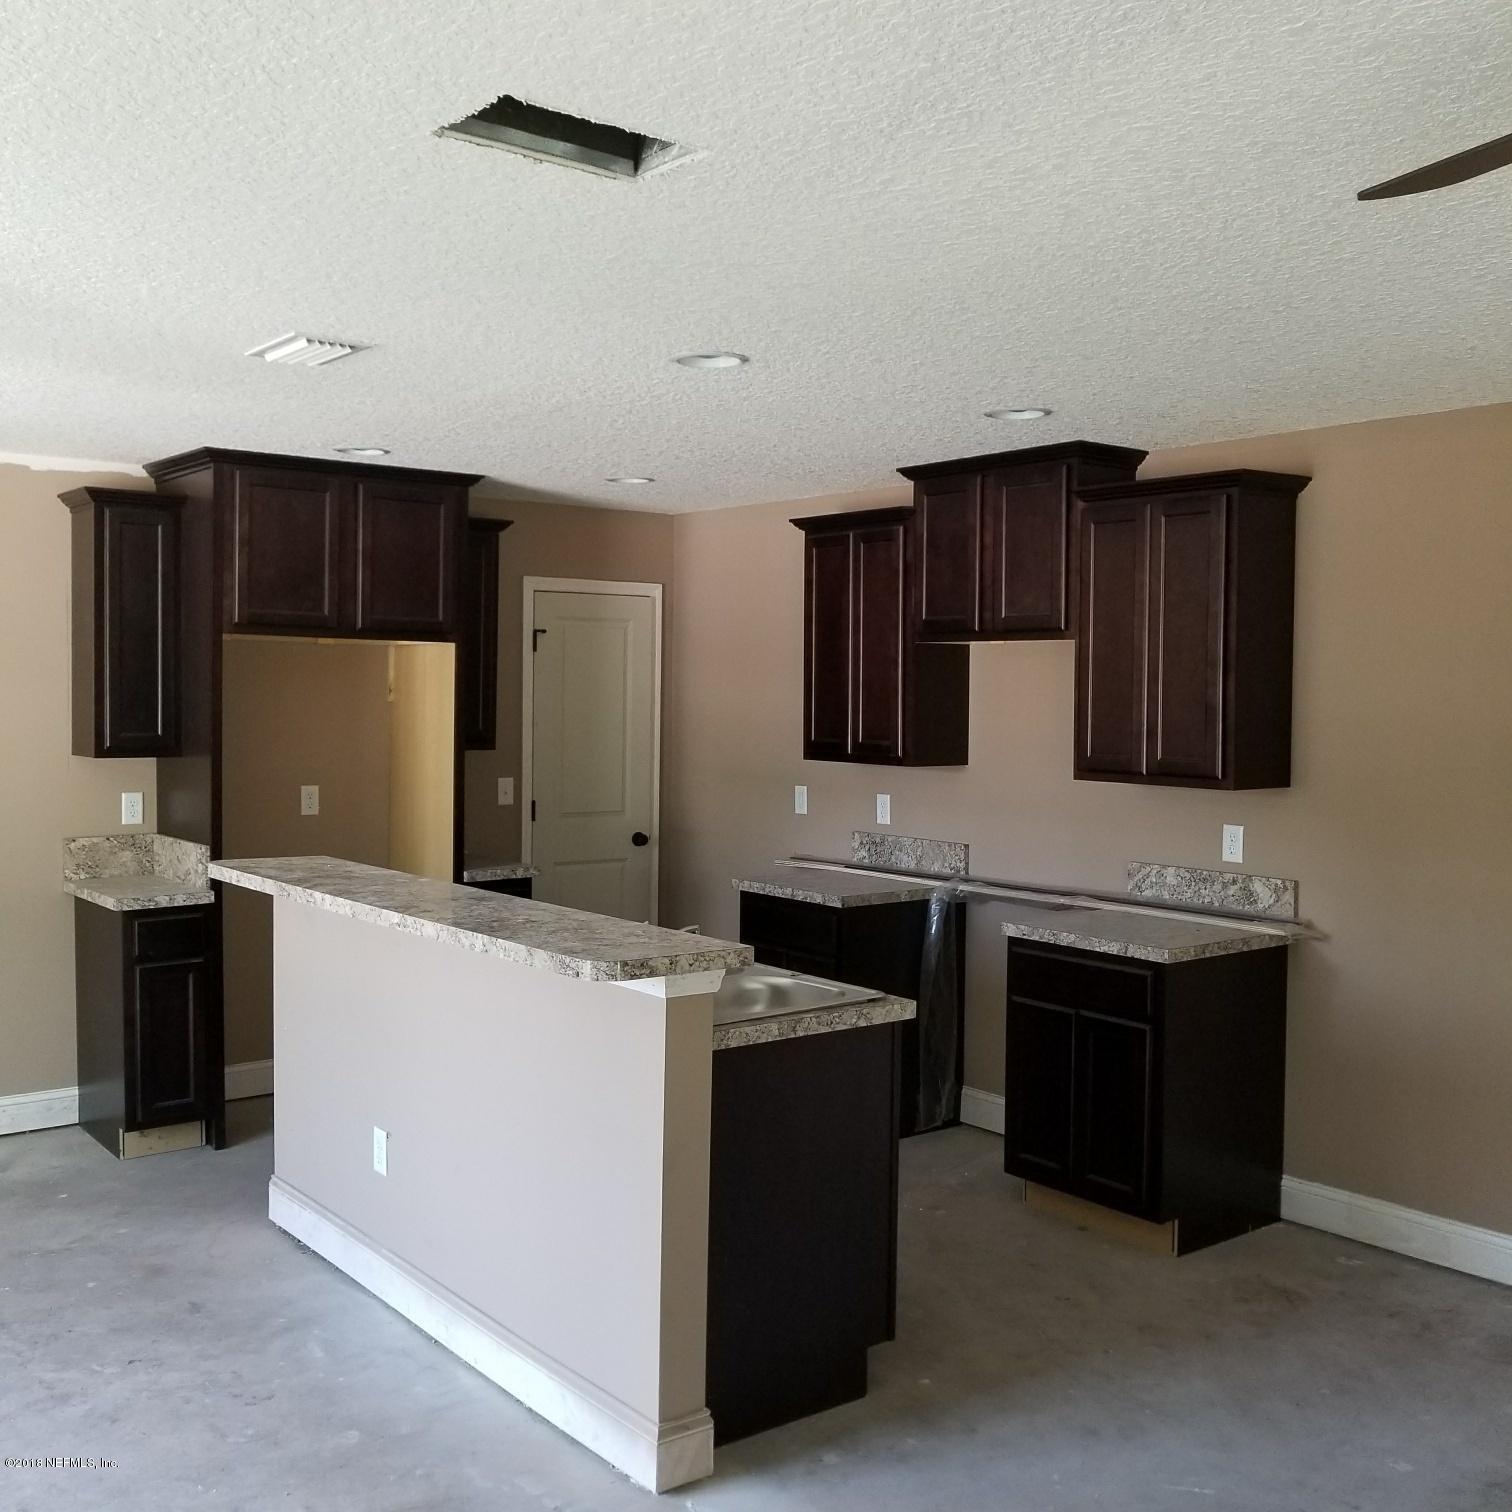 380 OLD JENNINGS, ORANGE PARK, FLORIDA 32065, 3 Bedrooms Bedrooms, ,2 BathroomsBathrooms,Residential - townhome,For sale,OLD JENNINGS,902821